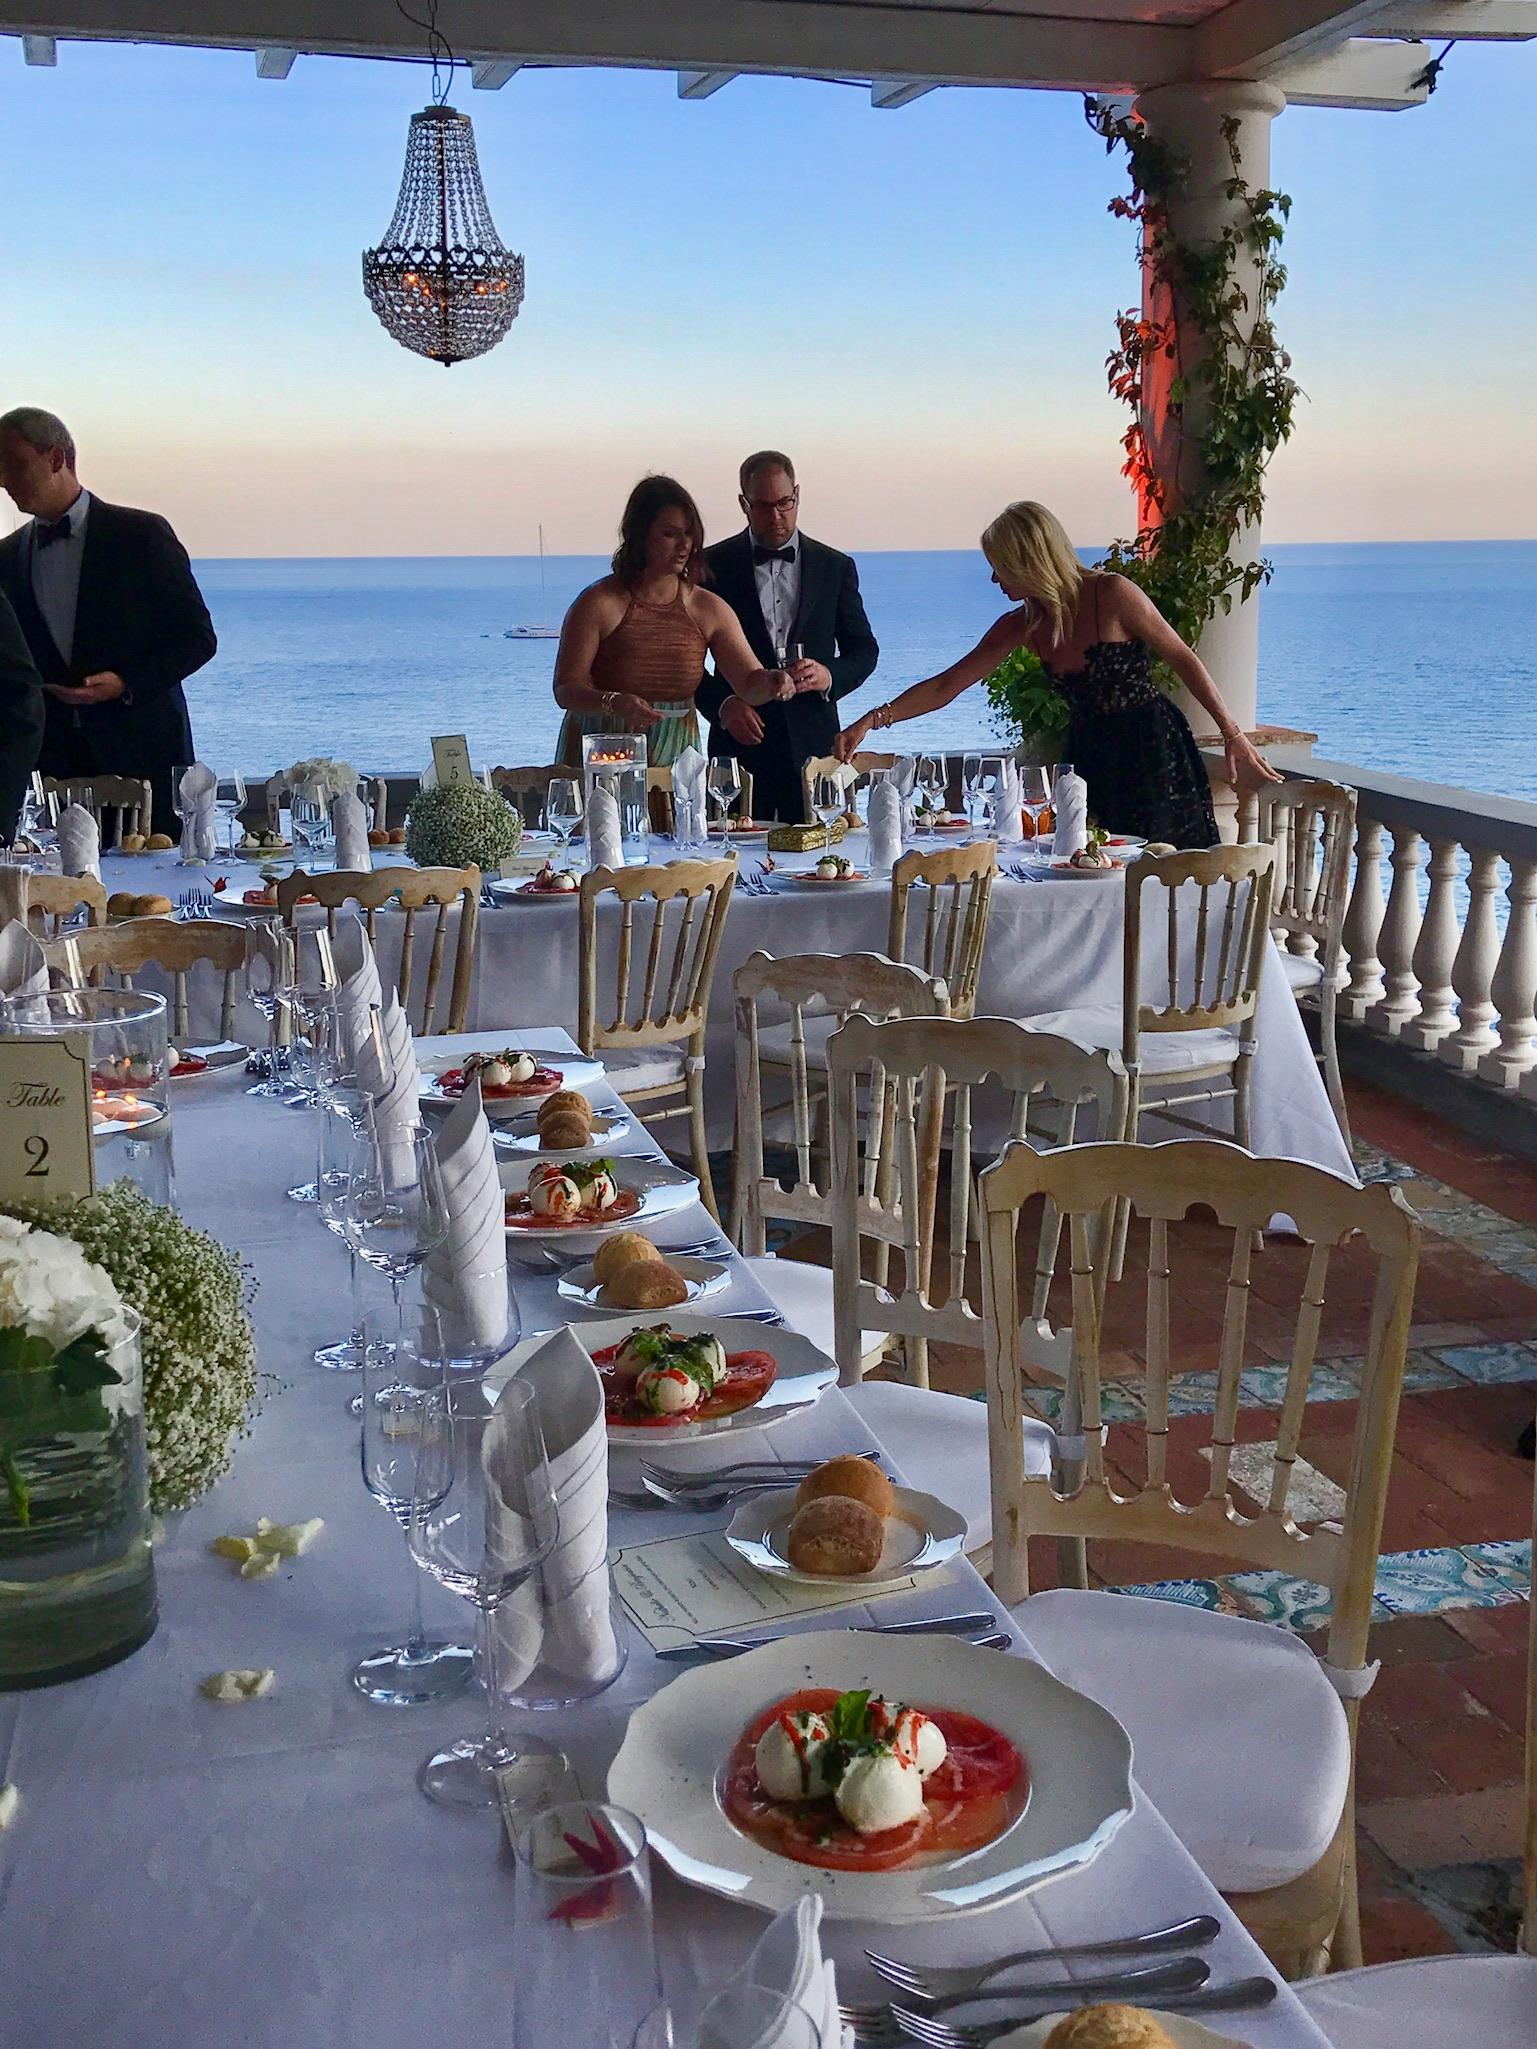 https://www.weddingamalfi.com/wp-content/uploads/Nathalie-and-Benjamin-wedding-in-Positano-4.jpg